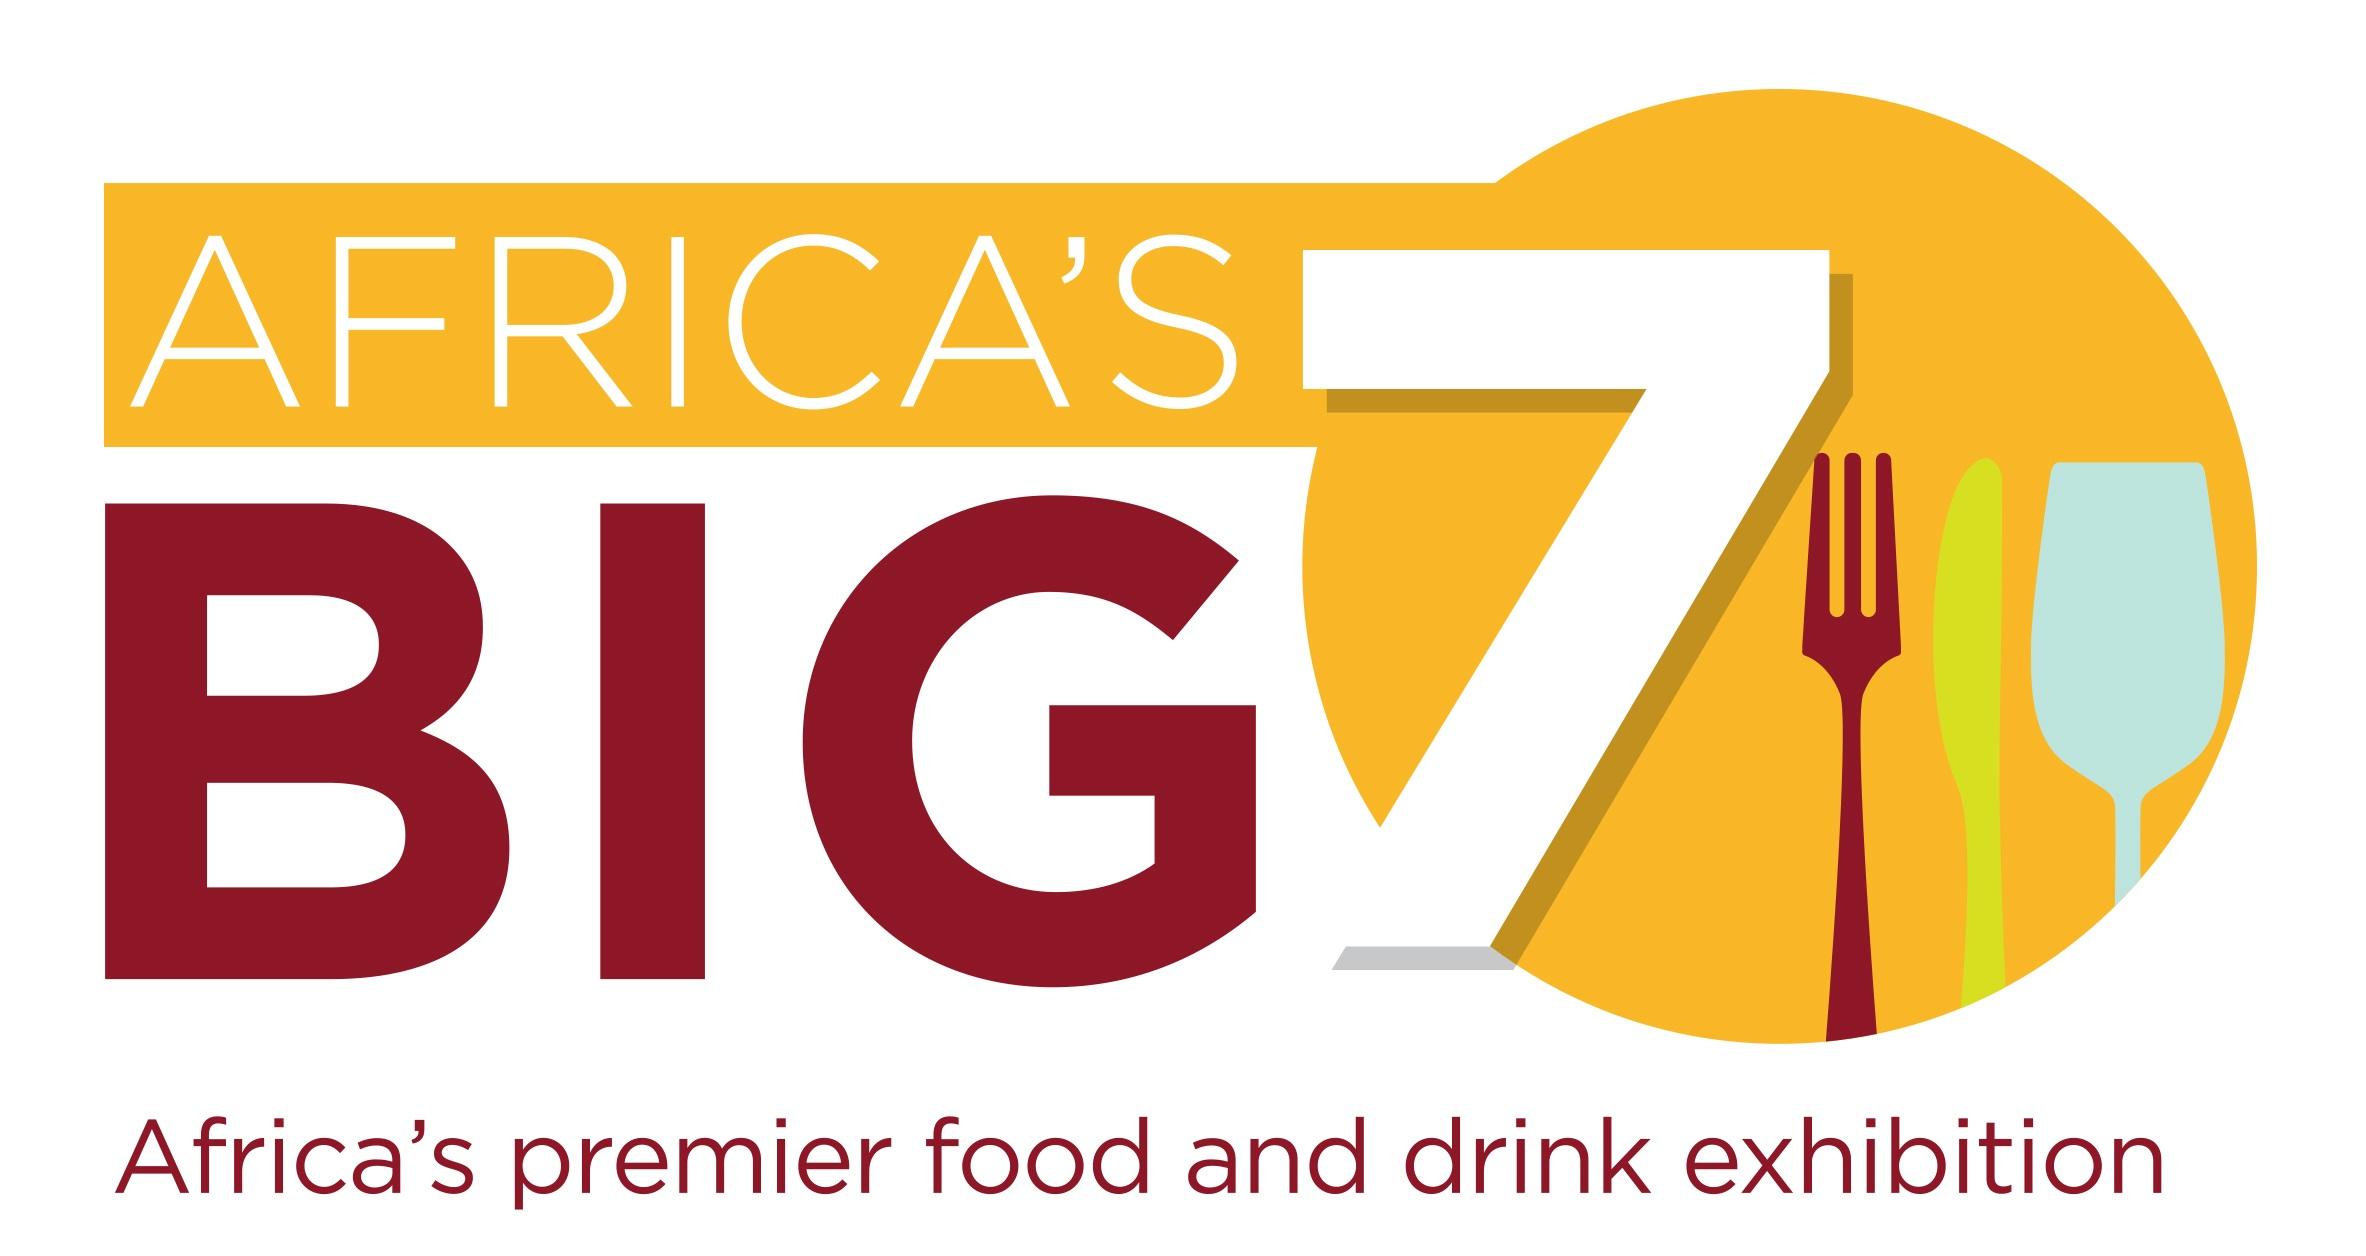 Africa Big 7